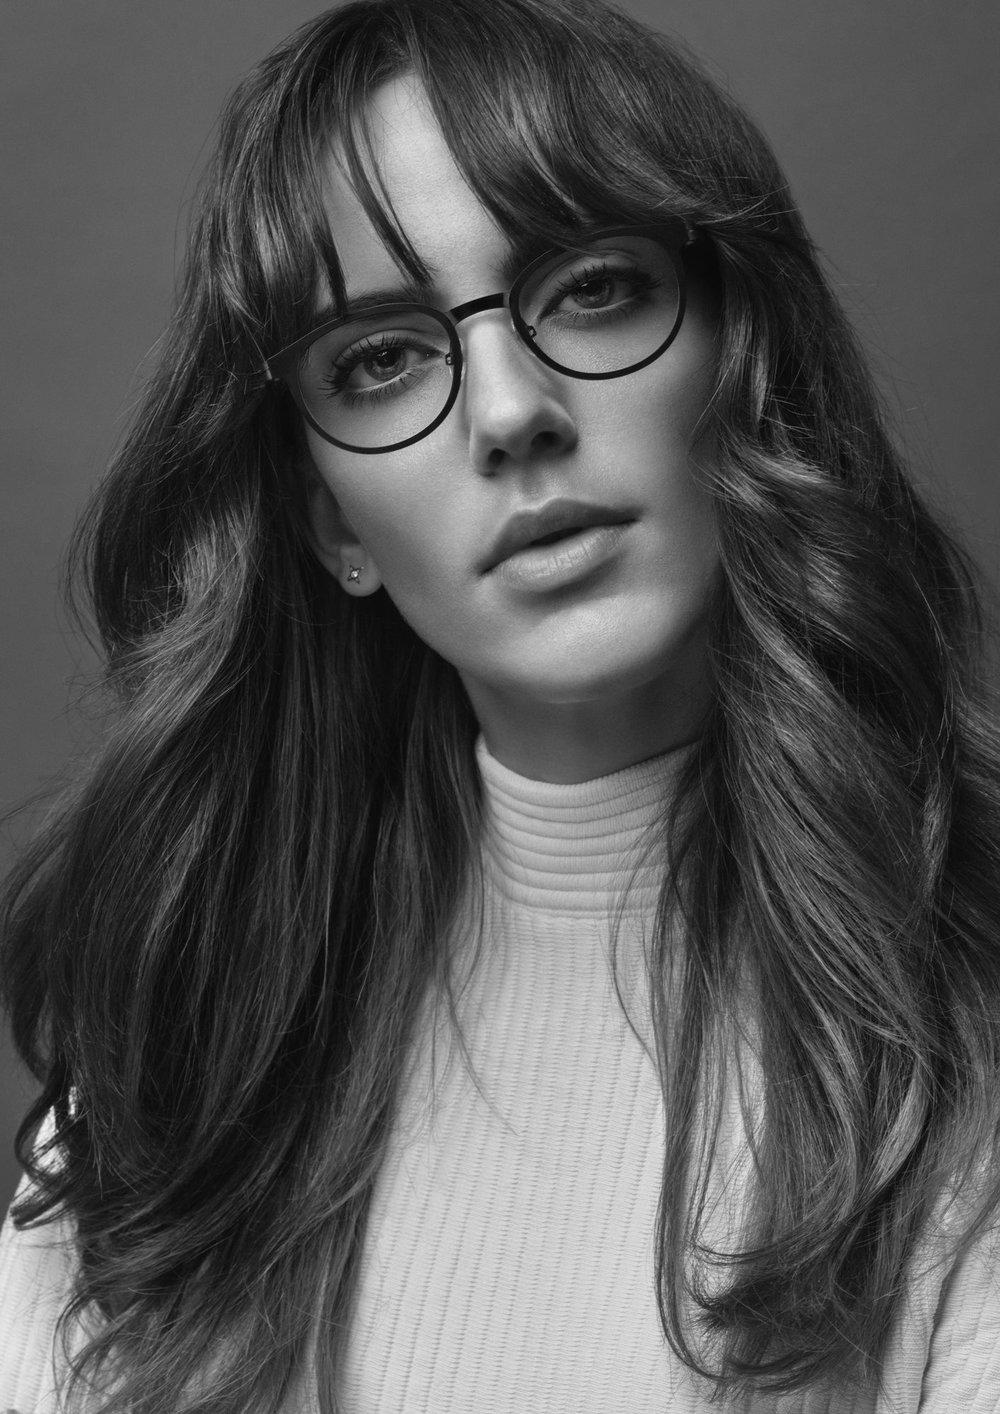 IMAGO RAPHAELA 6.IMAGO Michael Dengler Luna Elisa Federowicz Visagistin Hair & Make-up-Artist